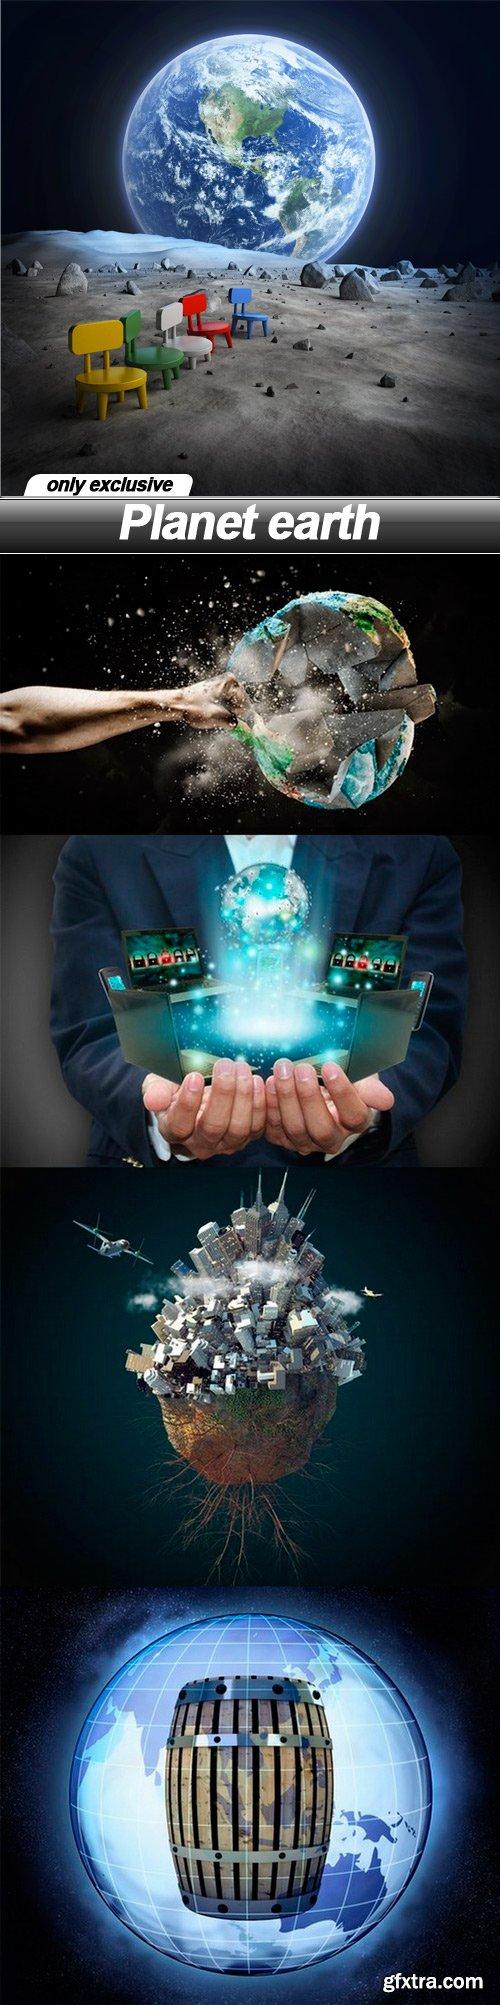 Planet earth - 5 UHQ JPEG